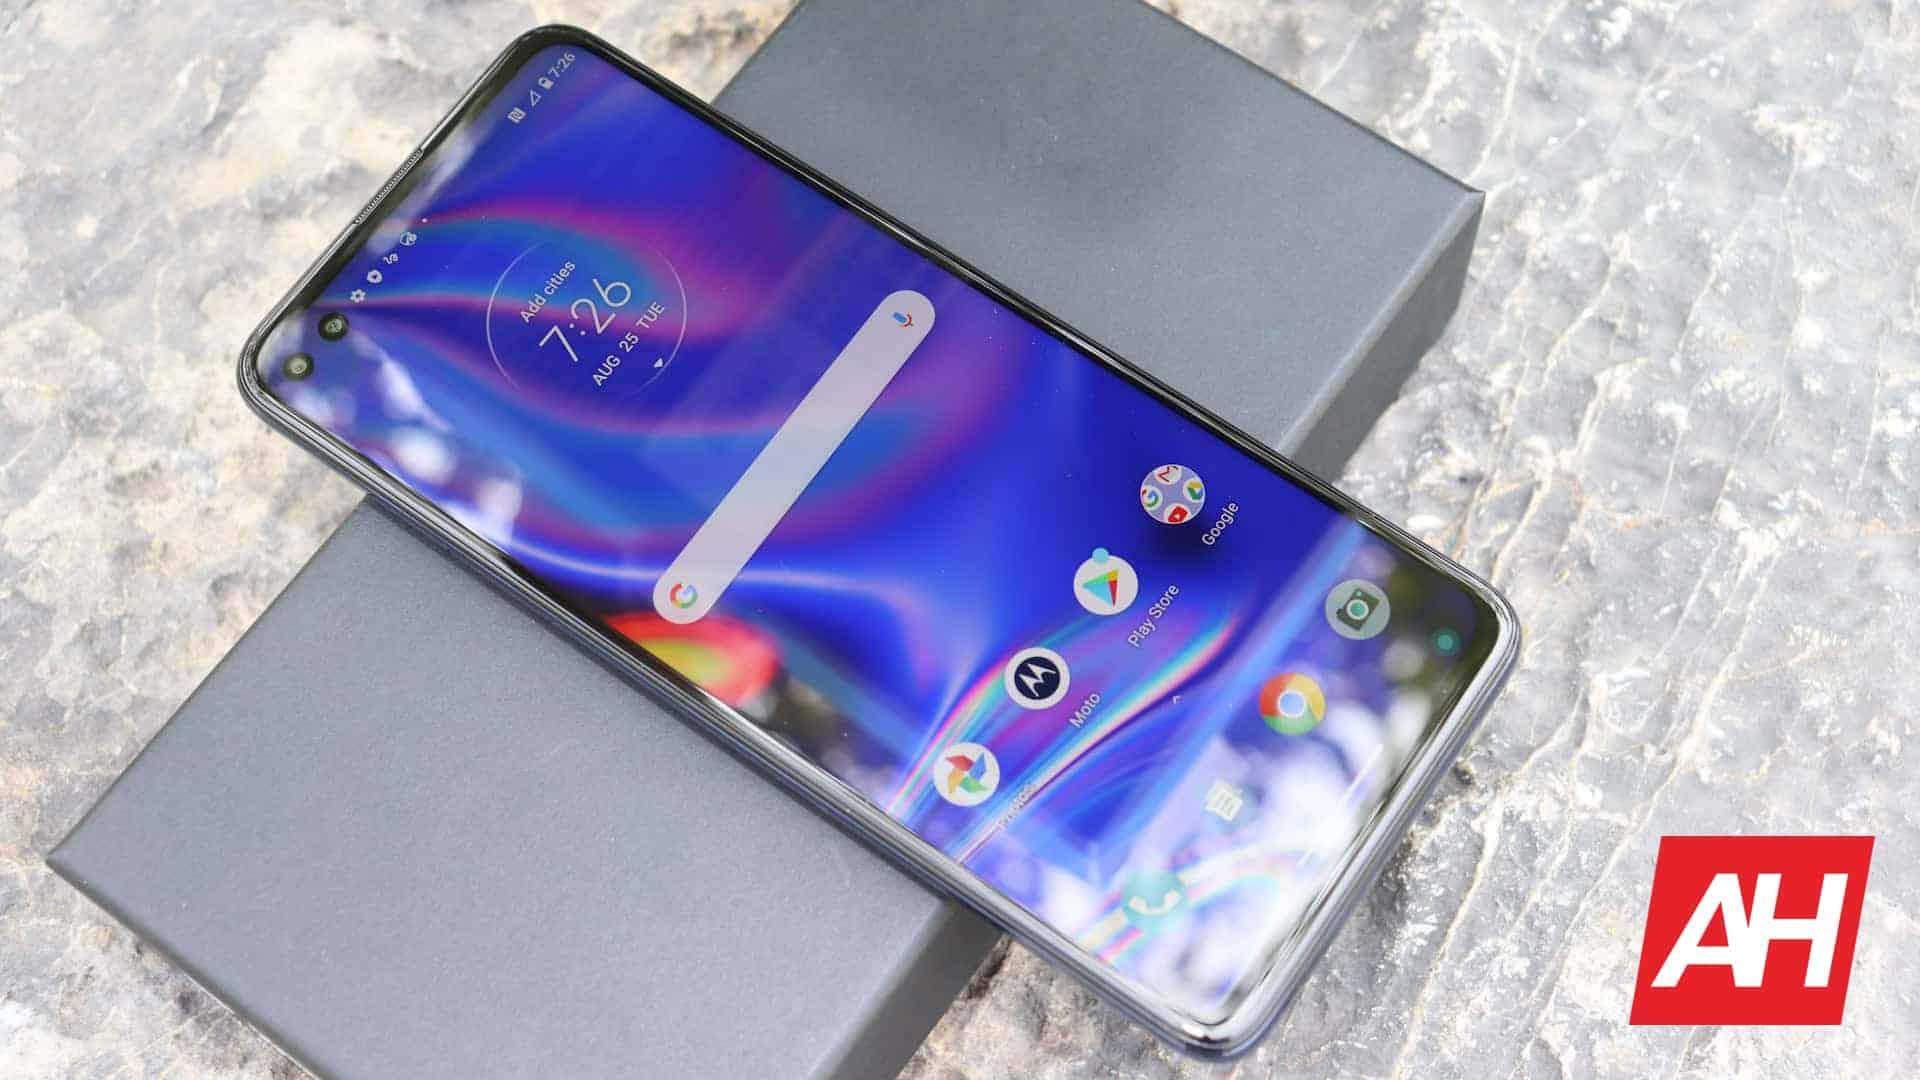 01 6 Motorola One 5G review AH 2020